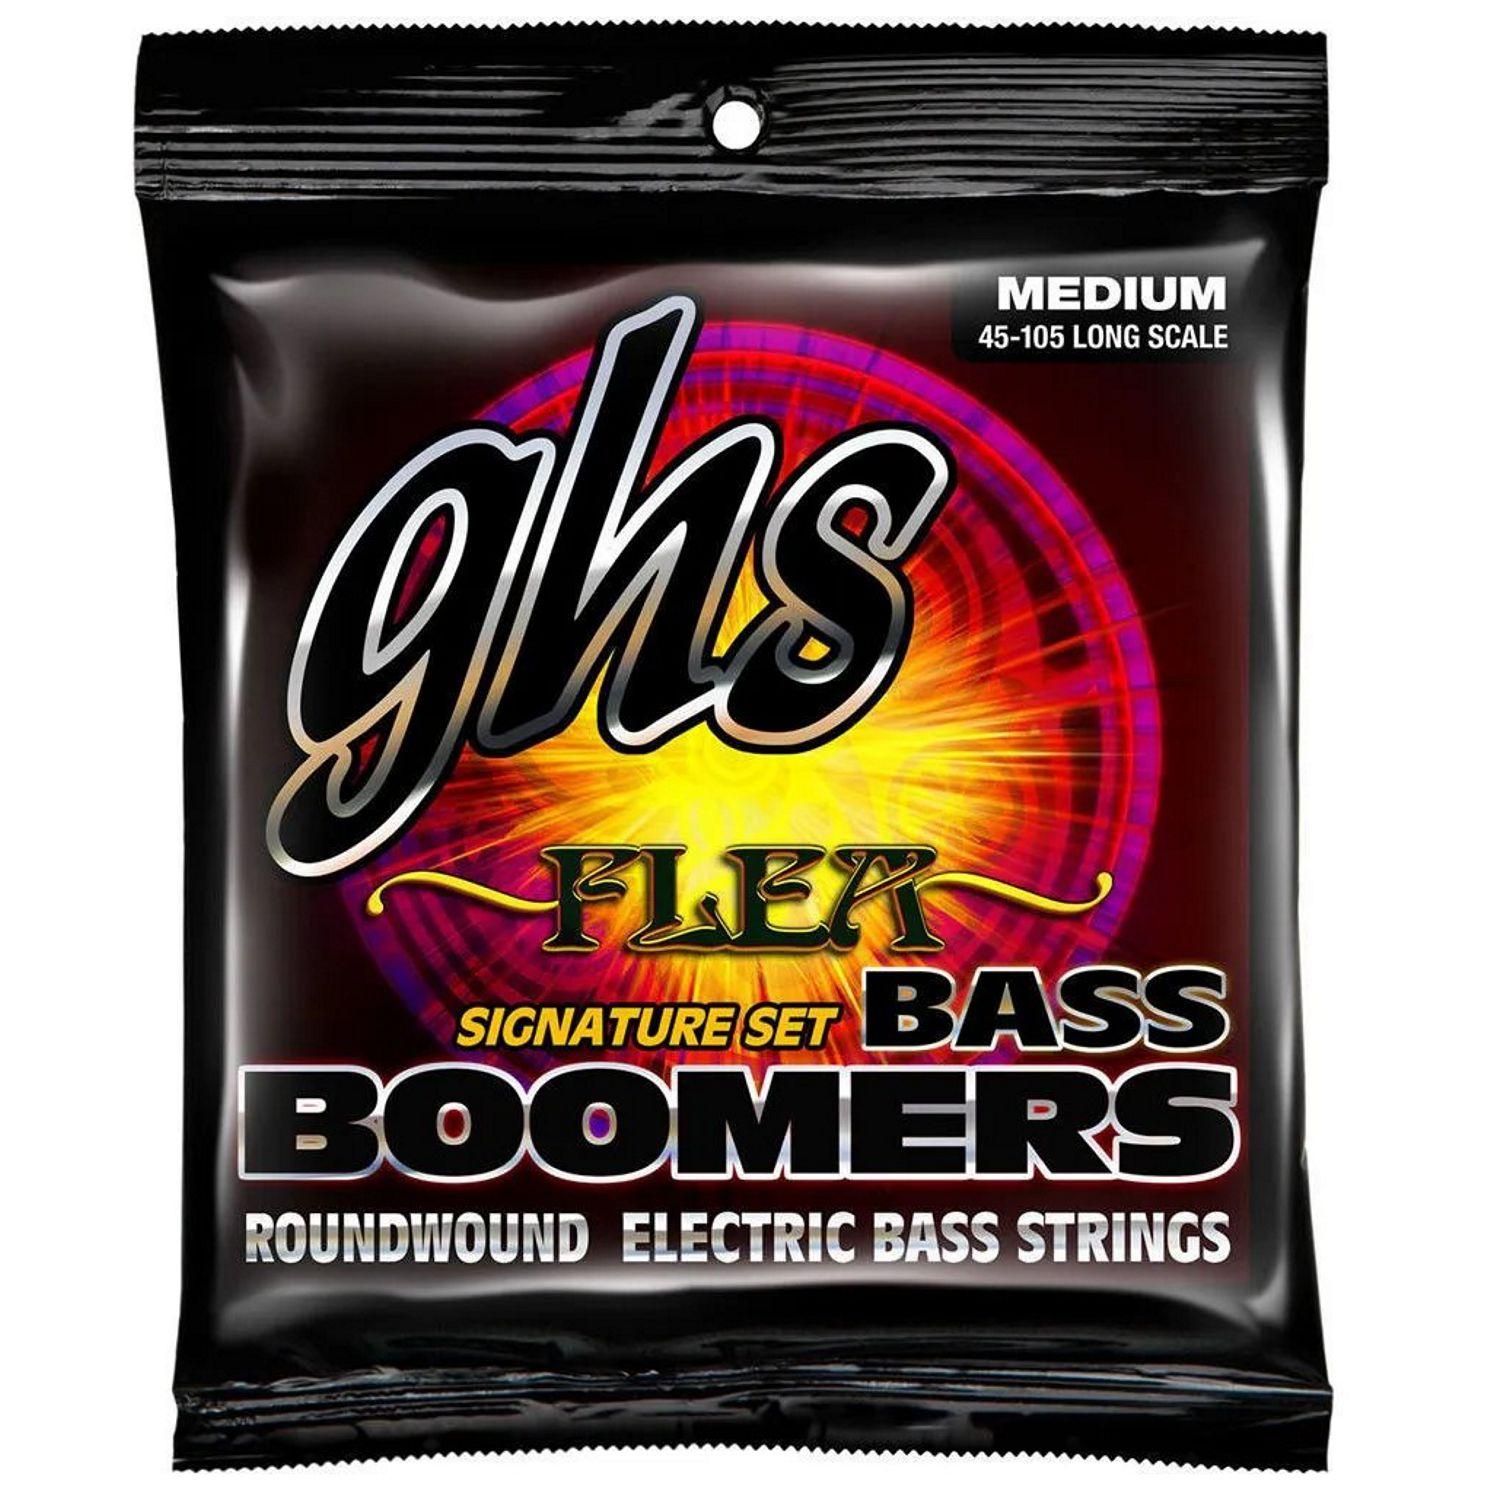 Encordoamento para Contra Baixo 4 Cordas GHS BASS Boomers Roundwound Flea Signature SET .045 - M3045F